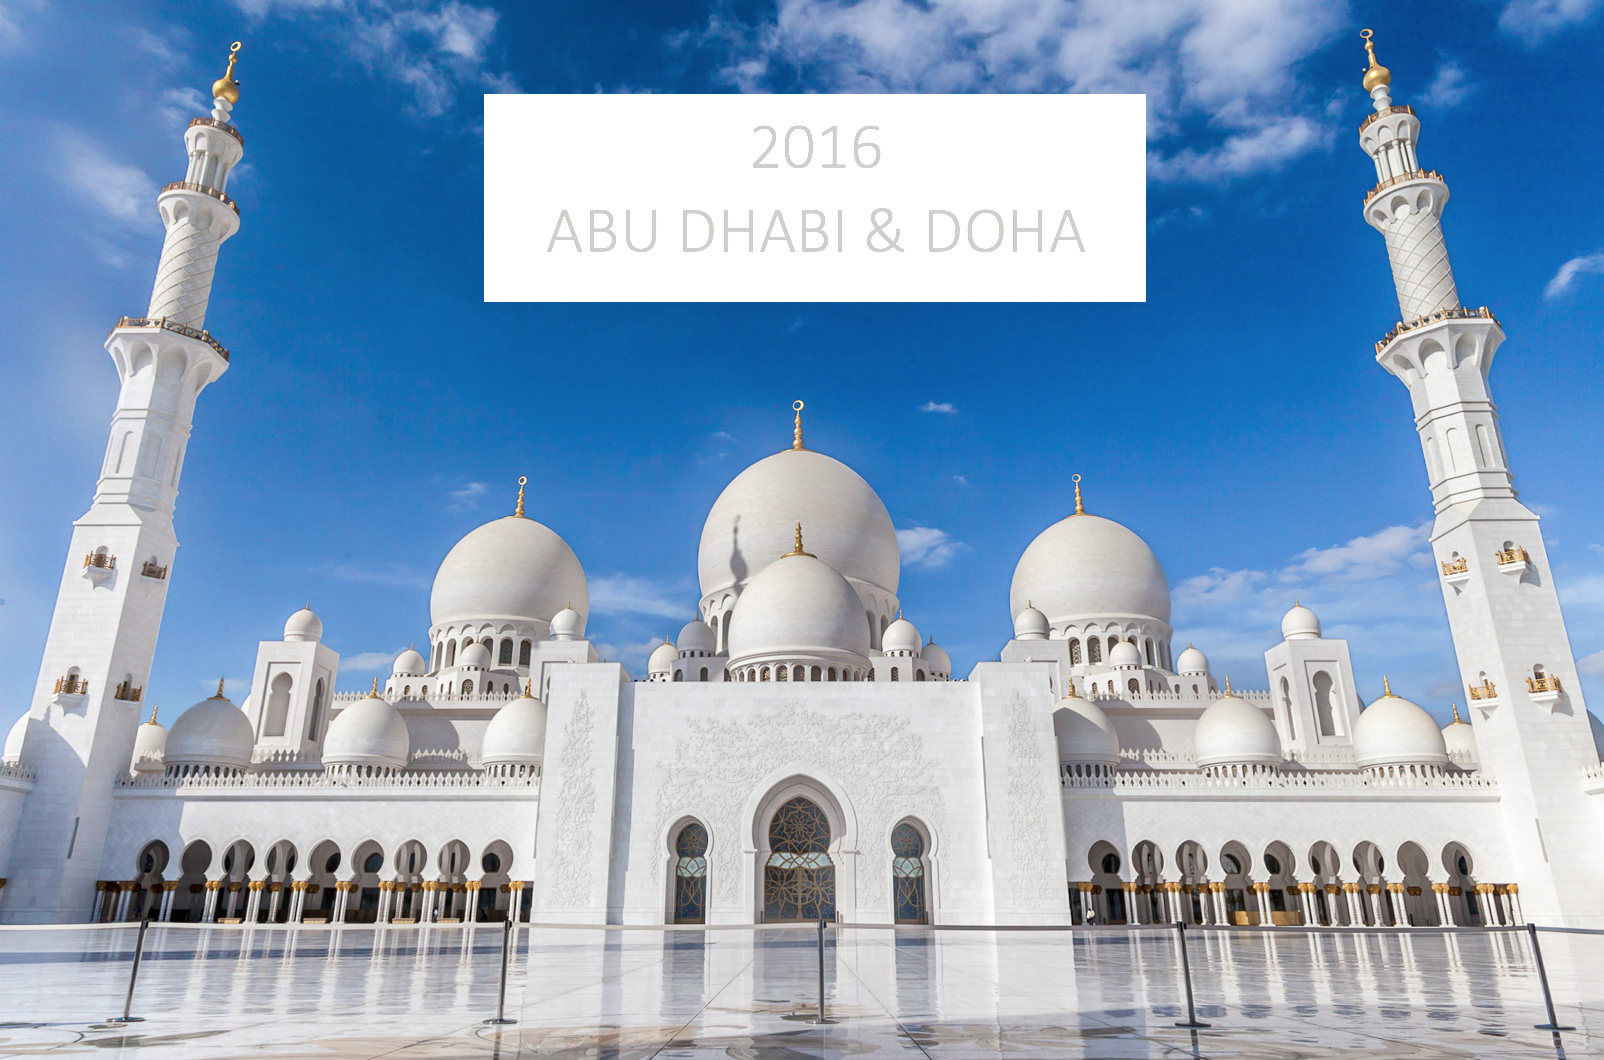 KKOY Abu Dhabi